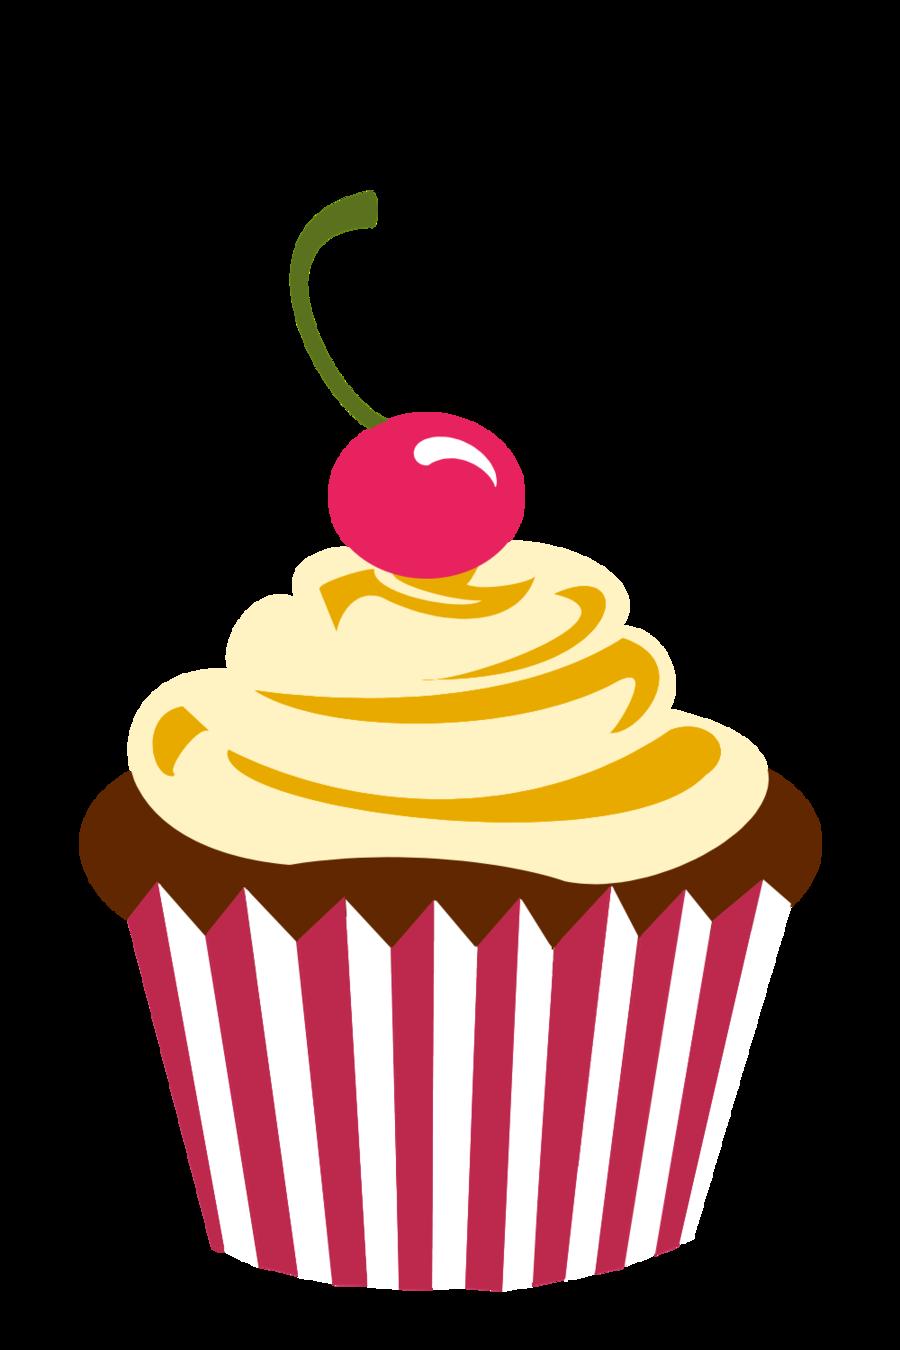 Pin By Stephanie Tarrer On Party Cupcake Logo Branding Pinterest